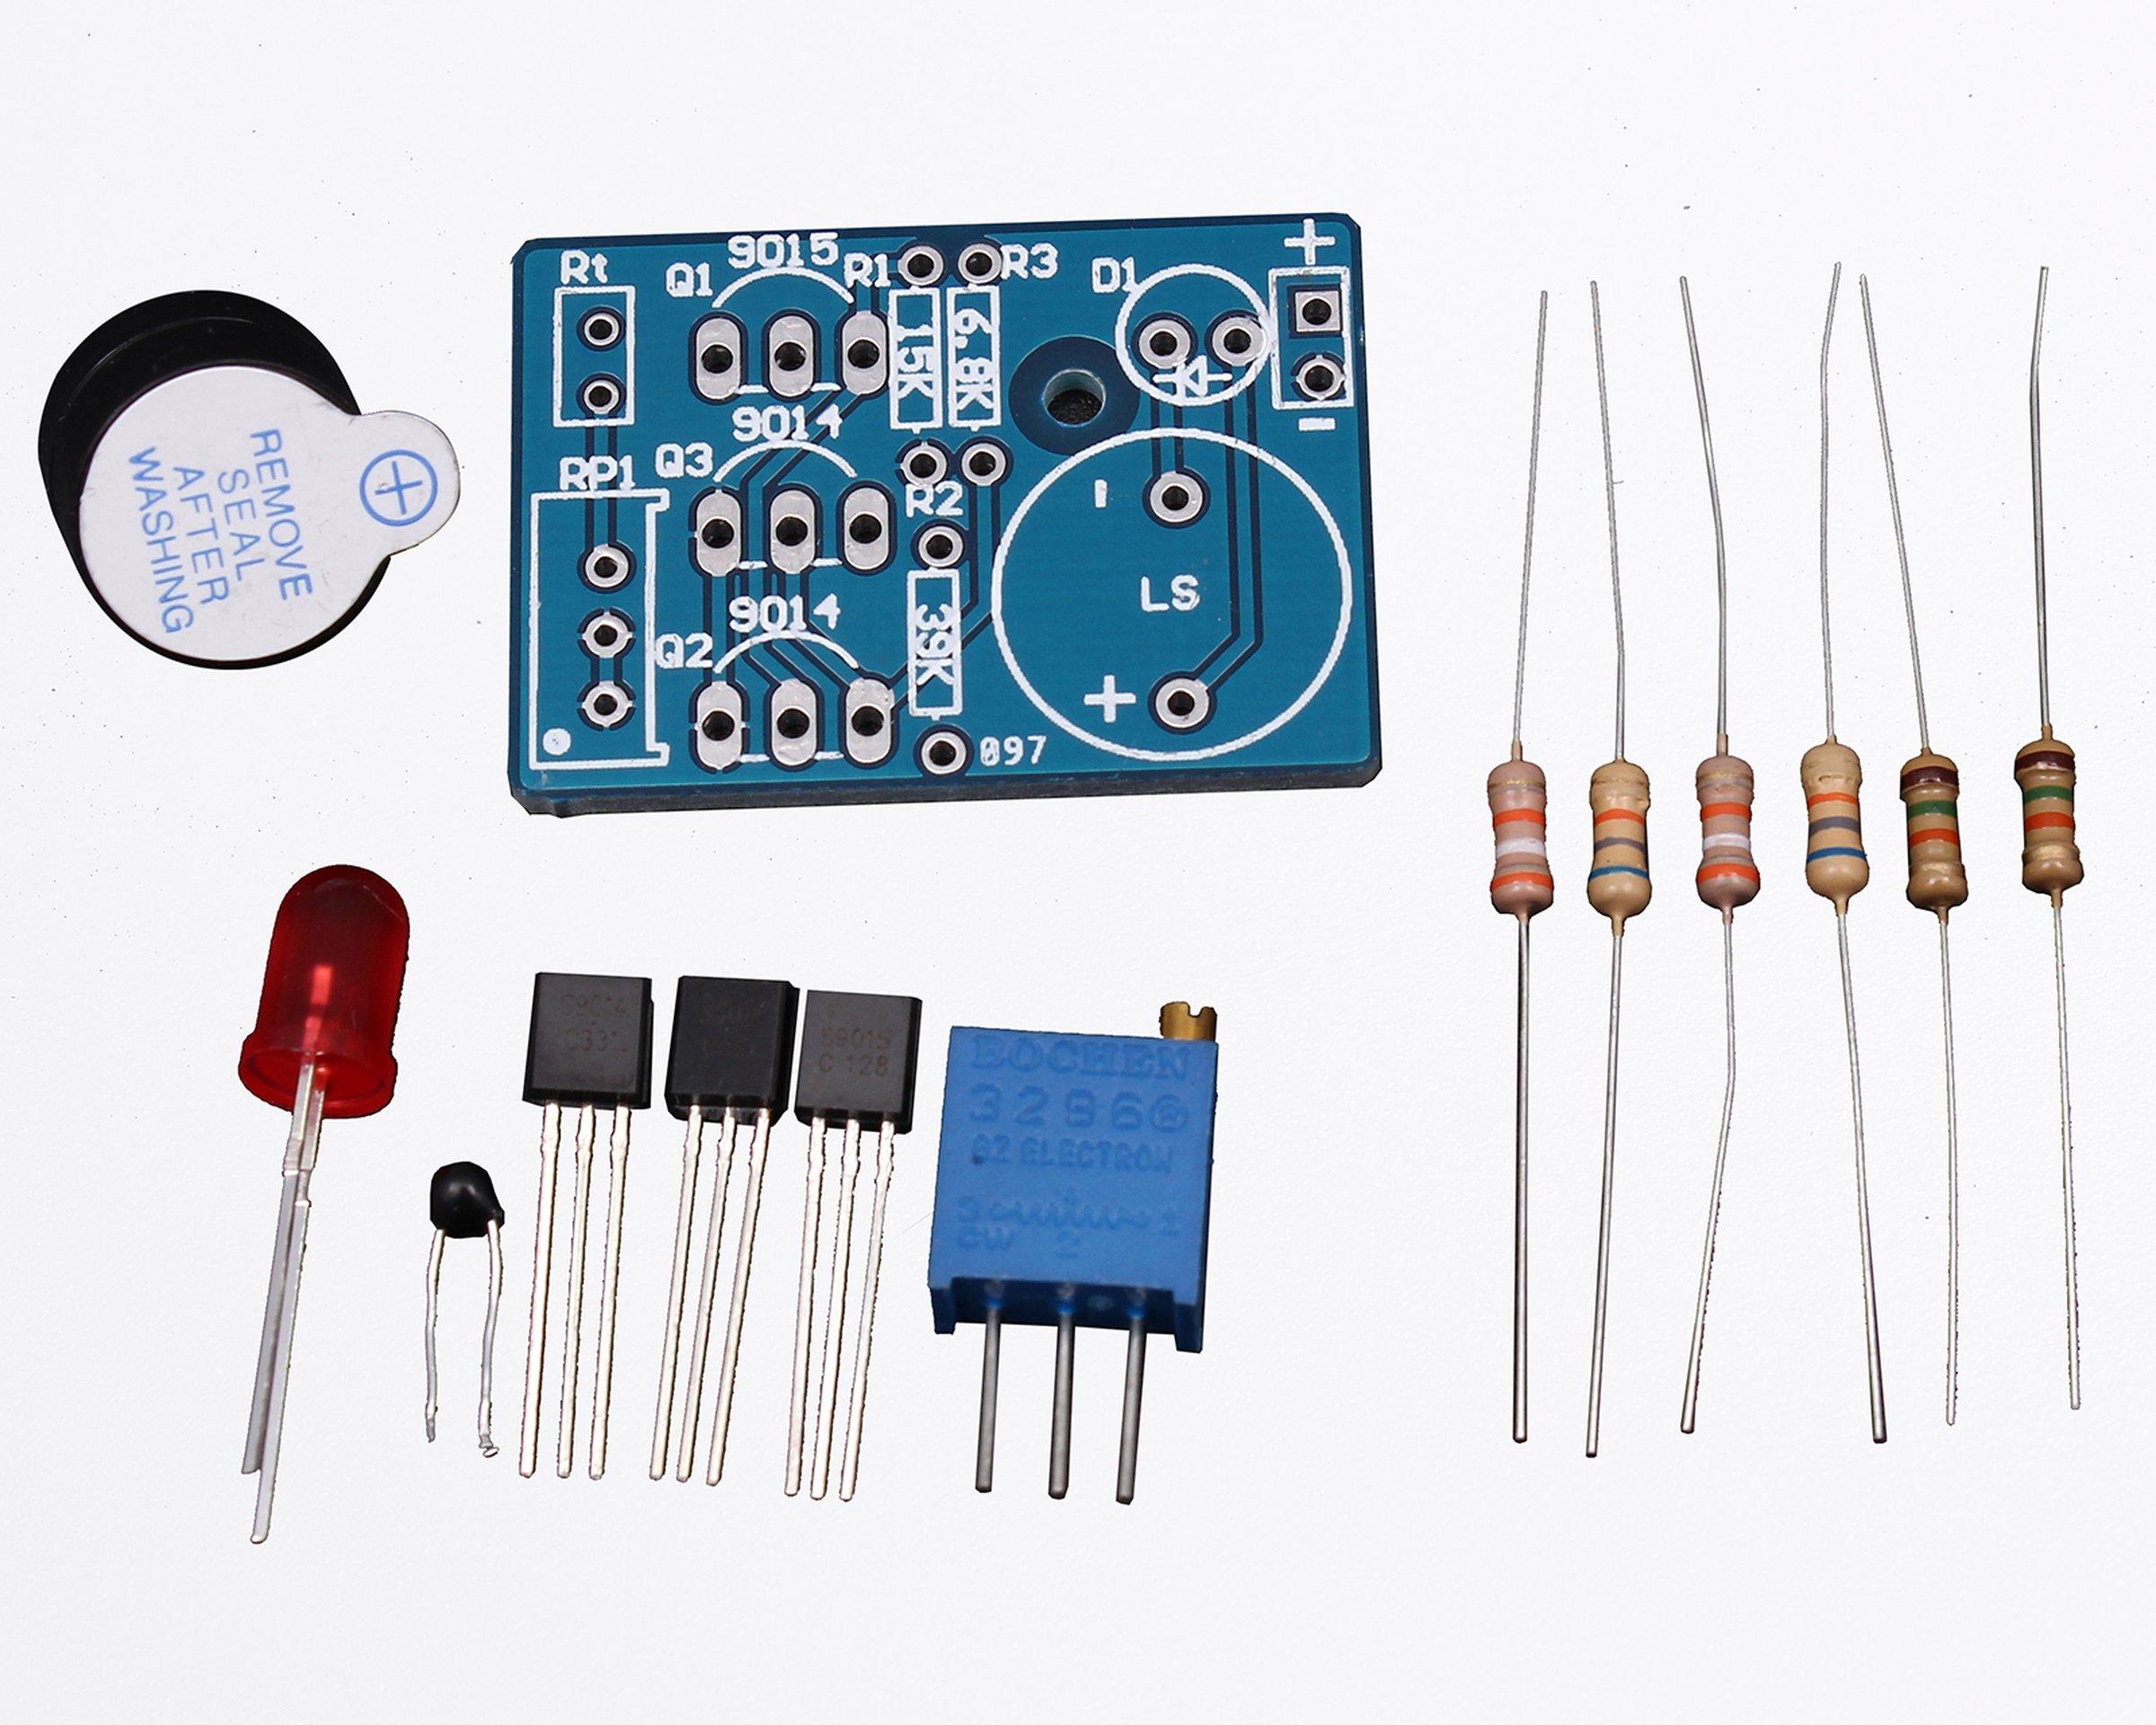 Lightalarm Wiring Diagram Page 3 And Schematics Infra Red Light Barrier Using 555 Temperature Control Sound Alarm Diy 5425 5